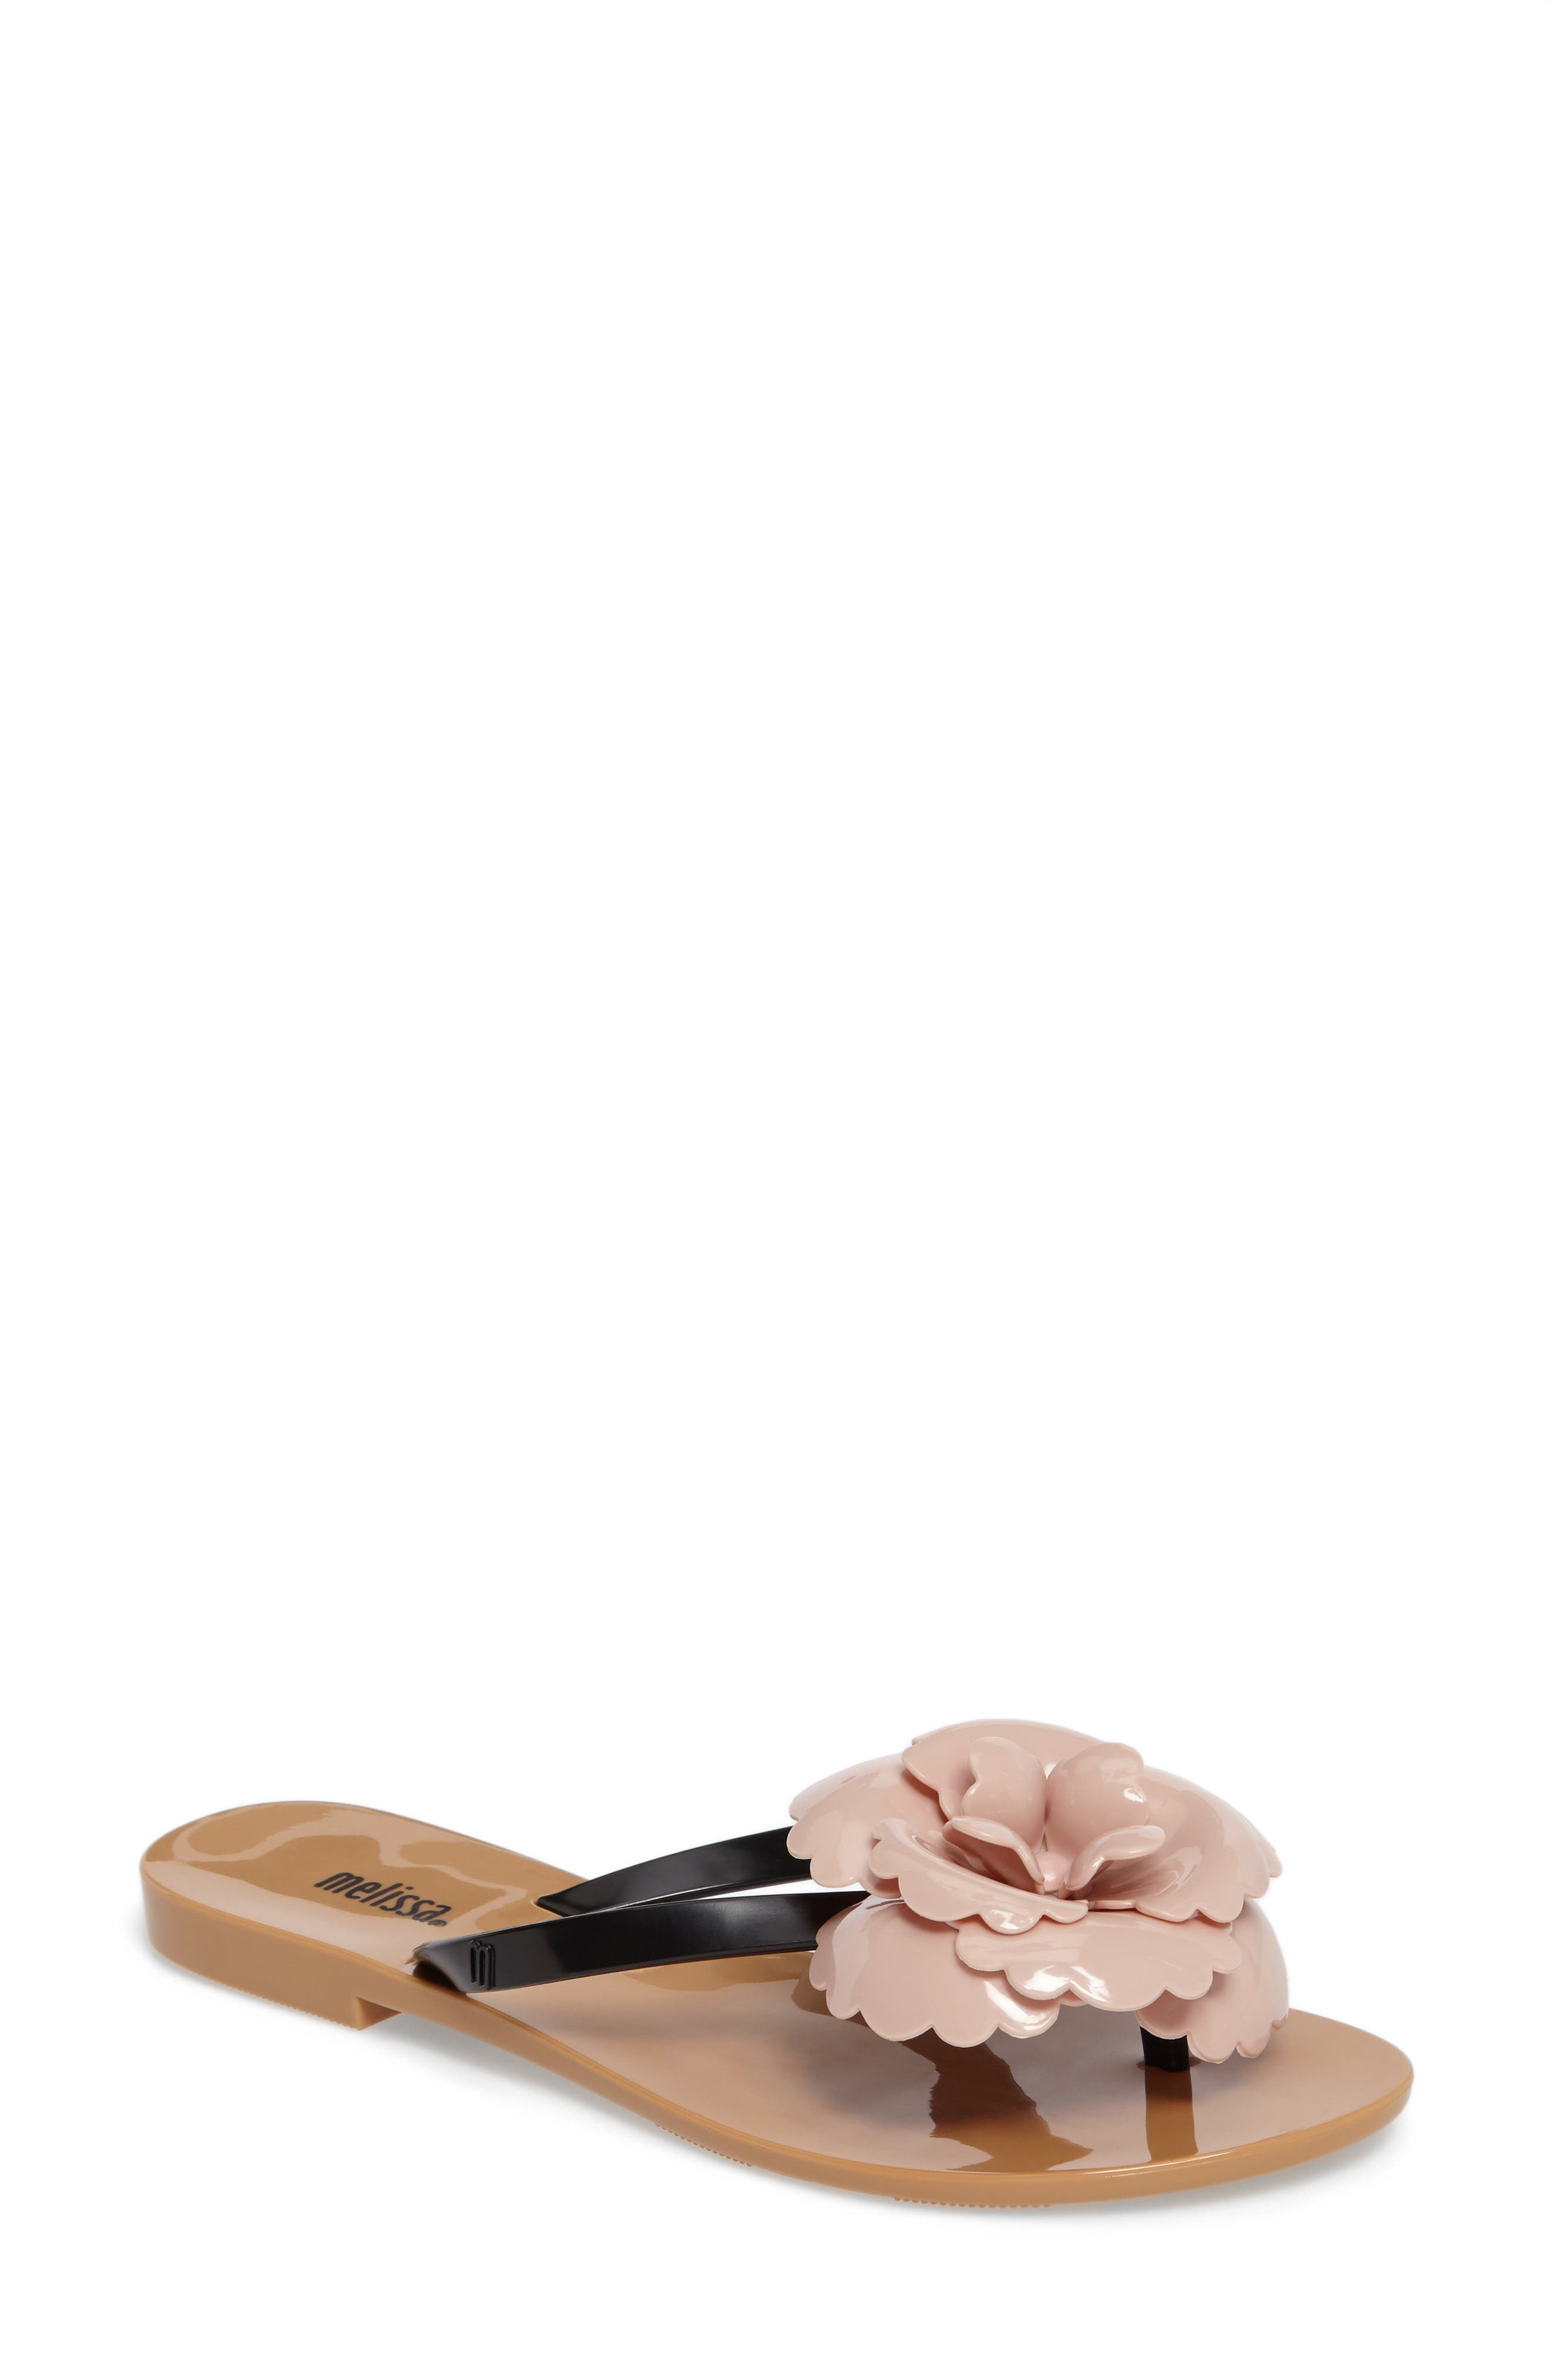 Main Image - Melissa Harmonic Flower Flip Flop (Women)